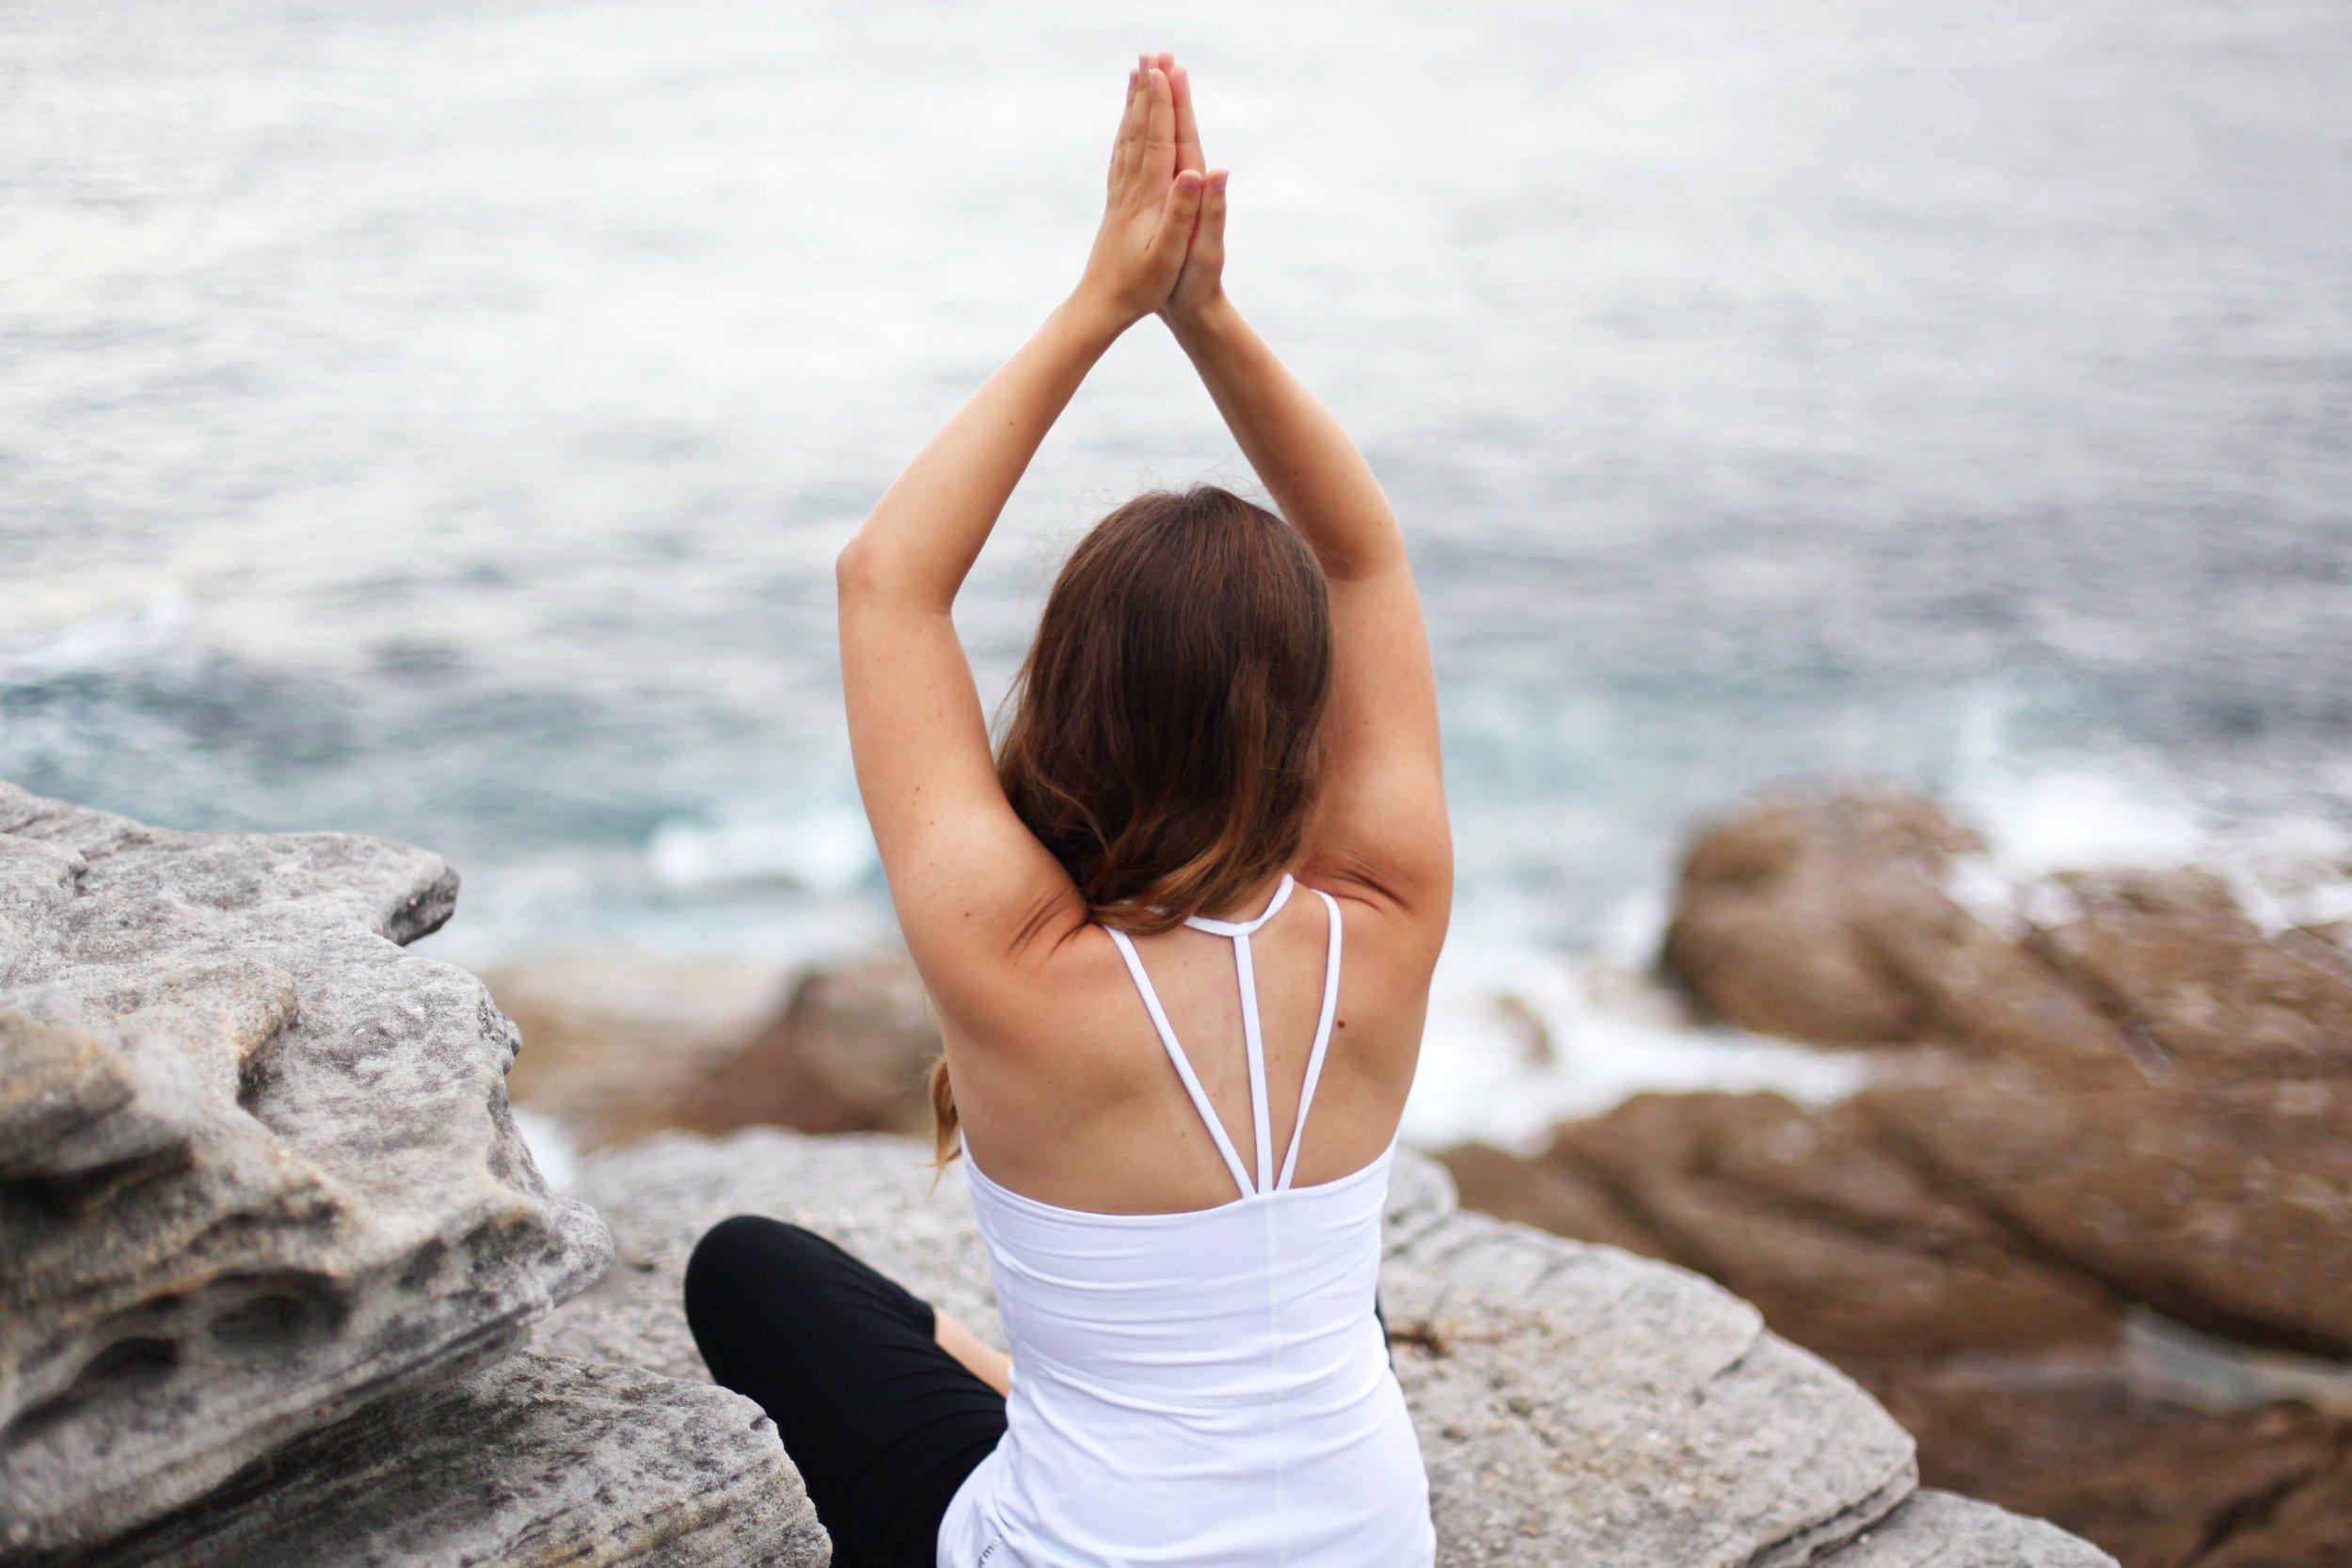 sarah-lewis-manifesting-raise-vibration